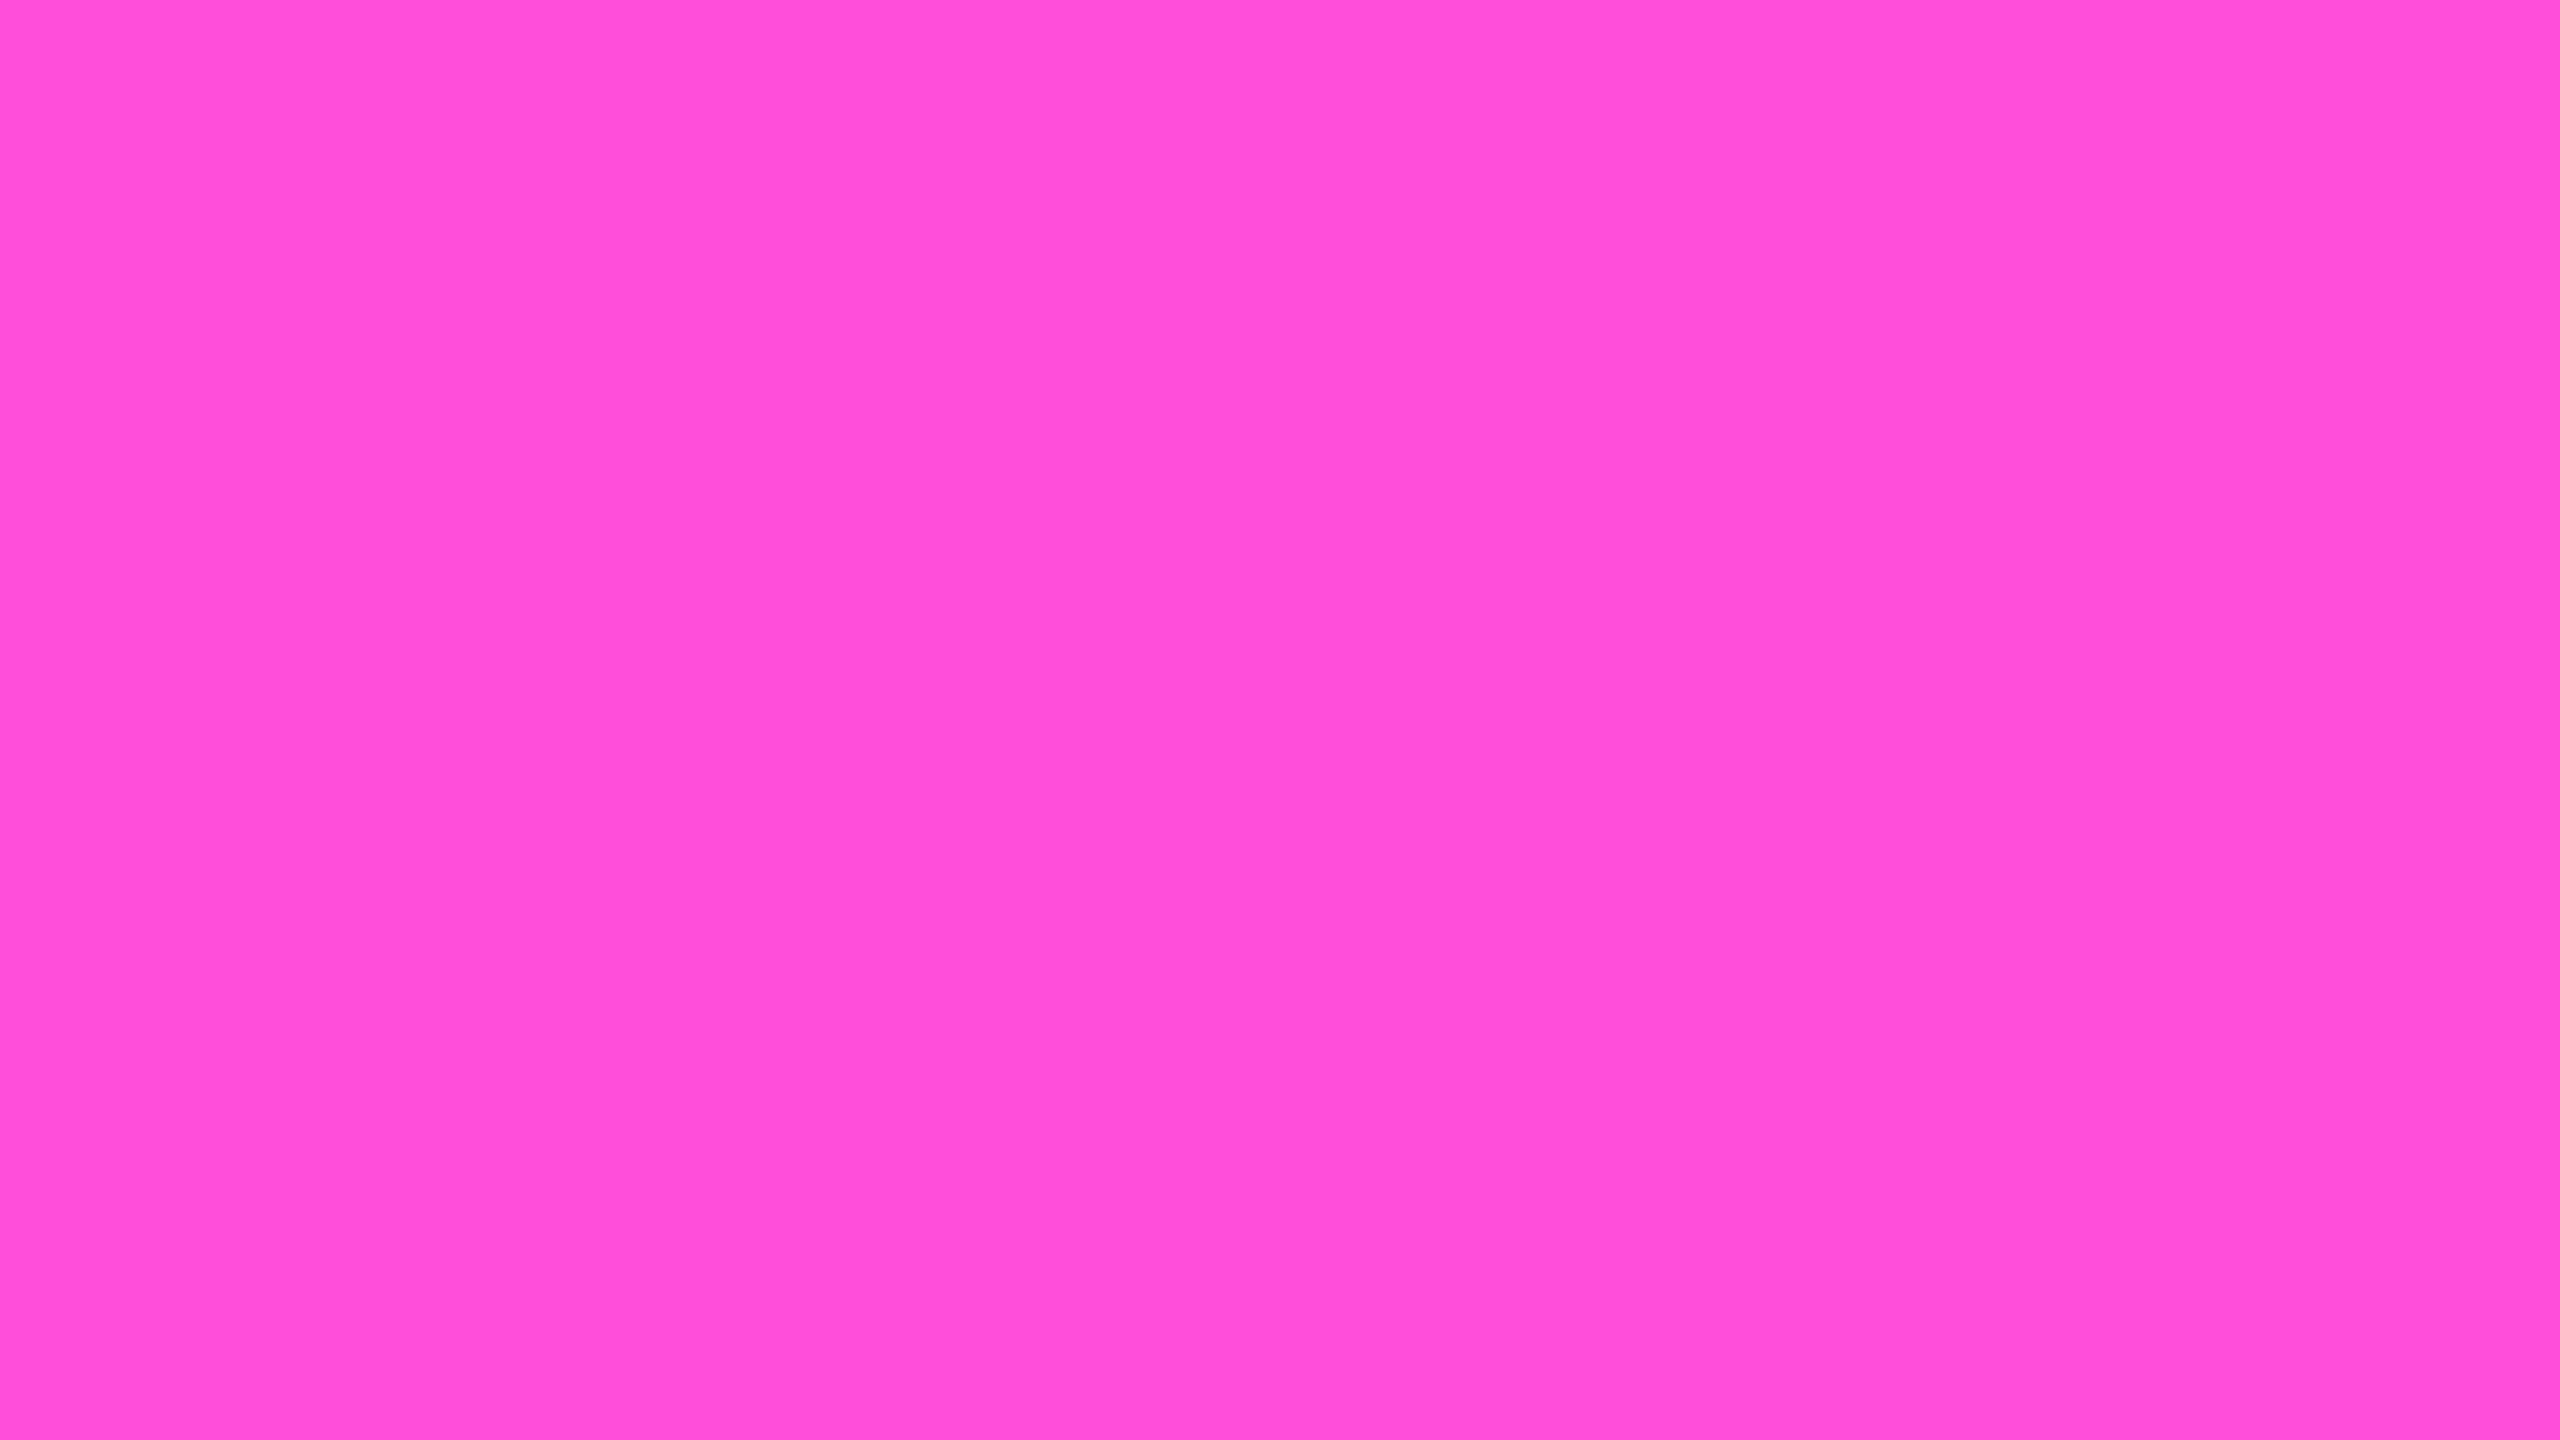 Purple Pizzazz Solid Color Background